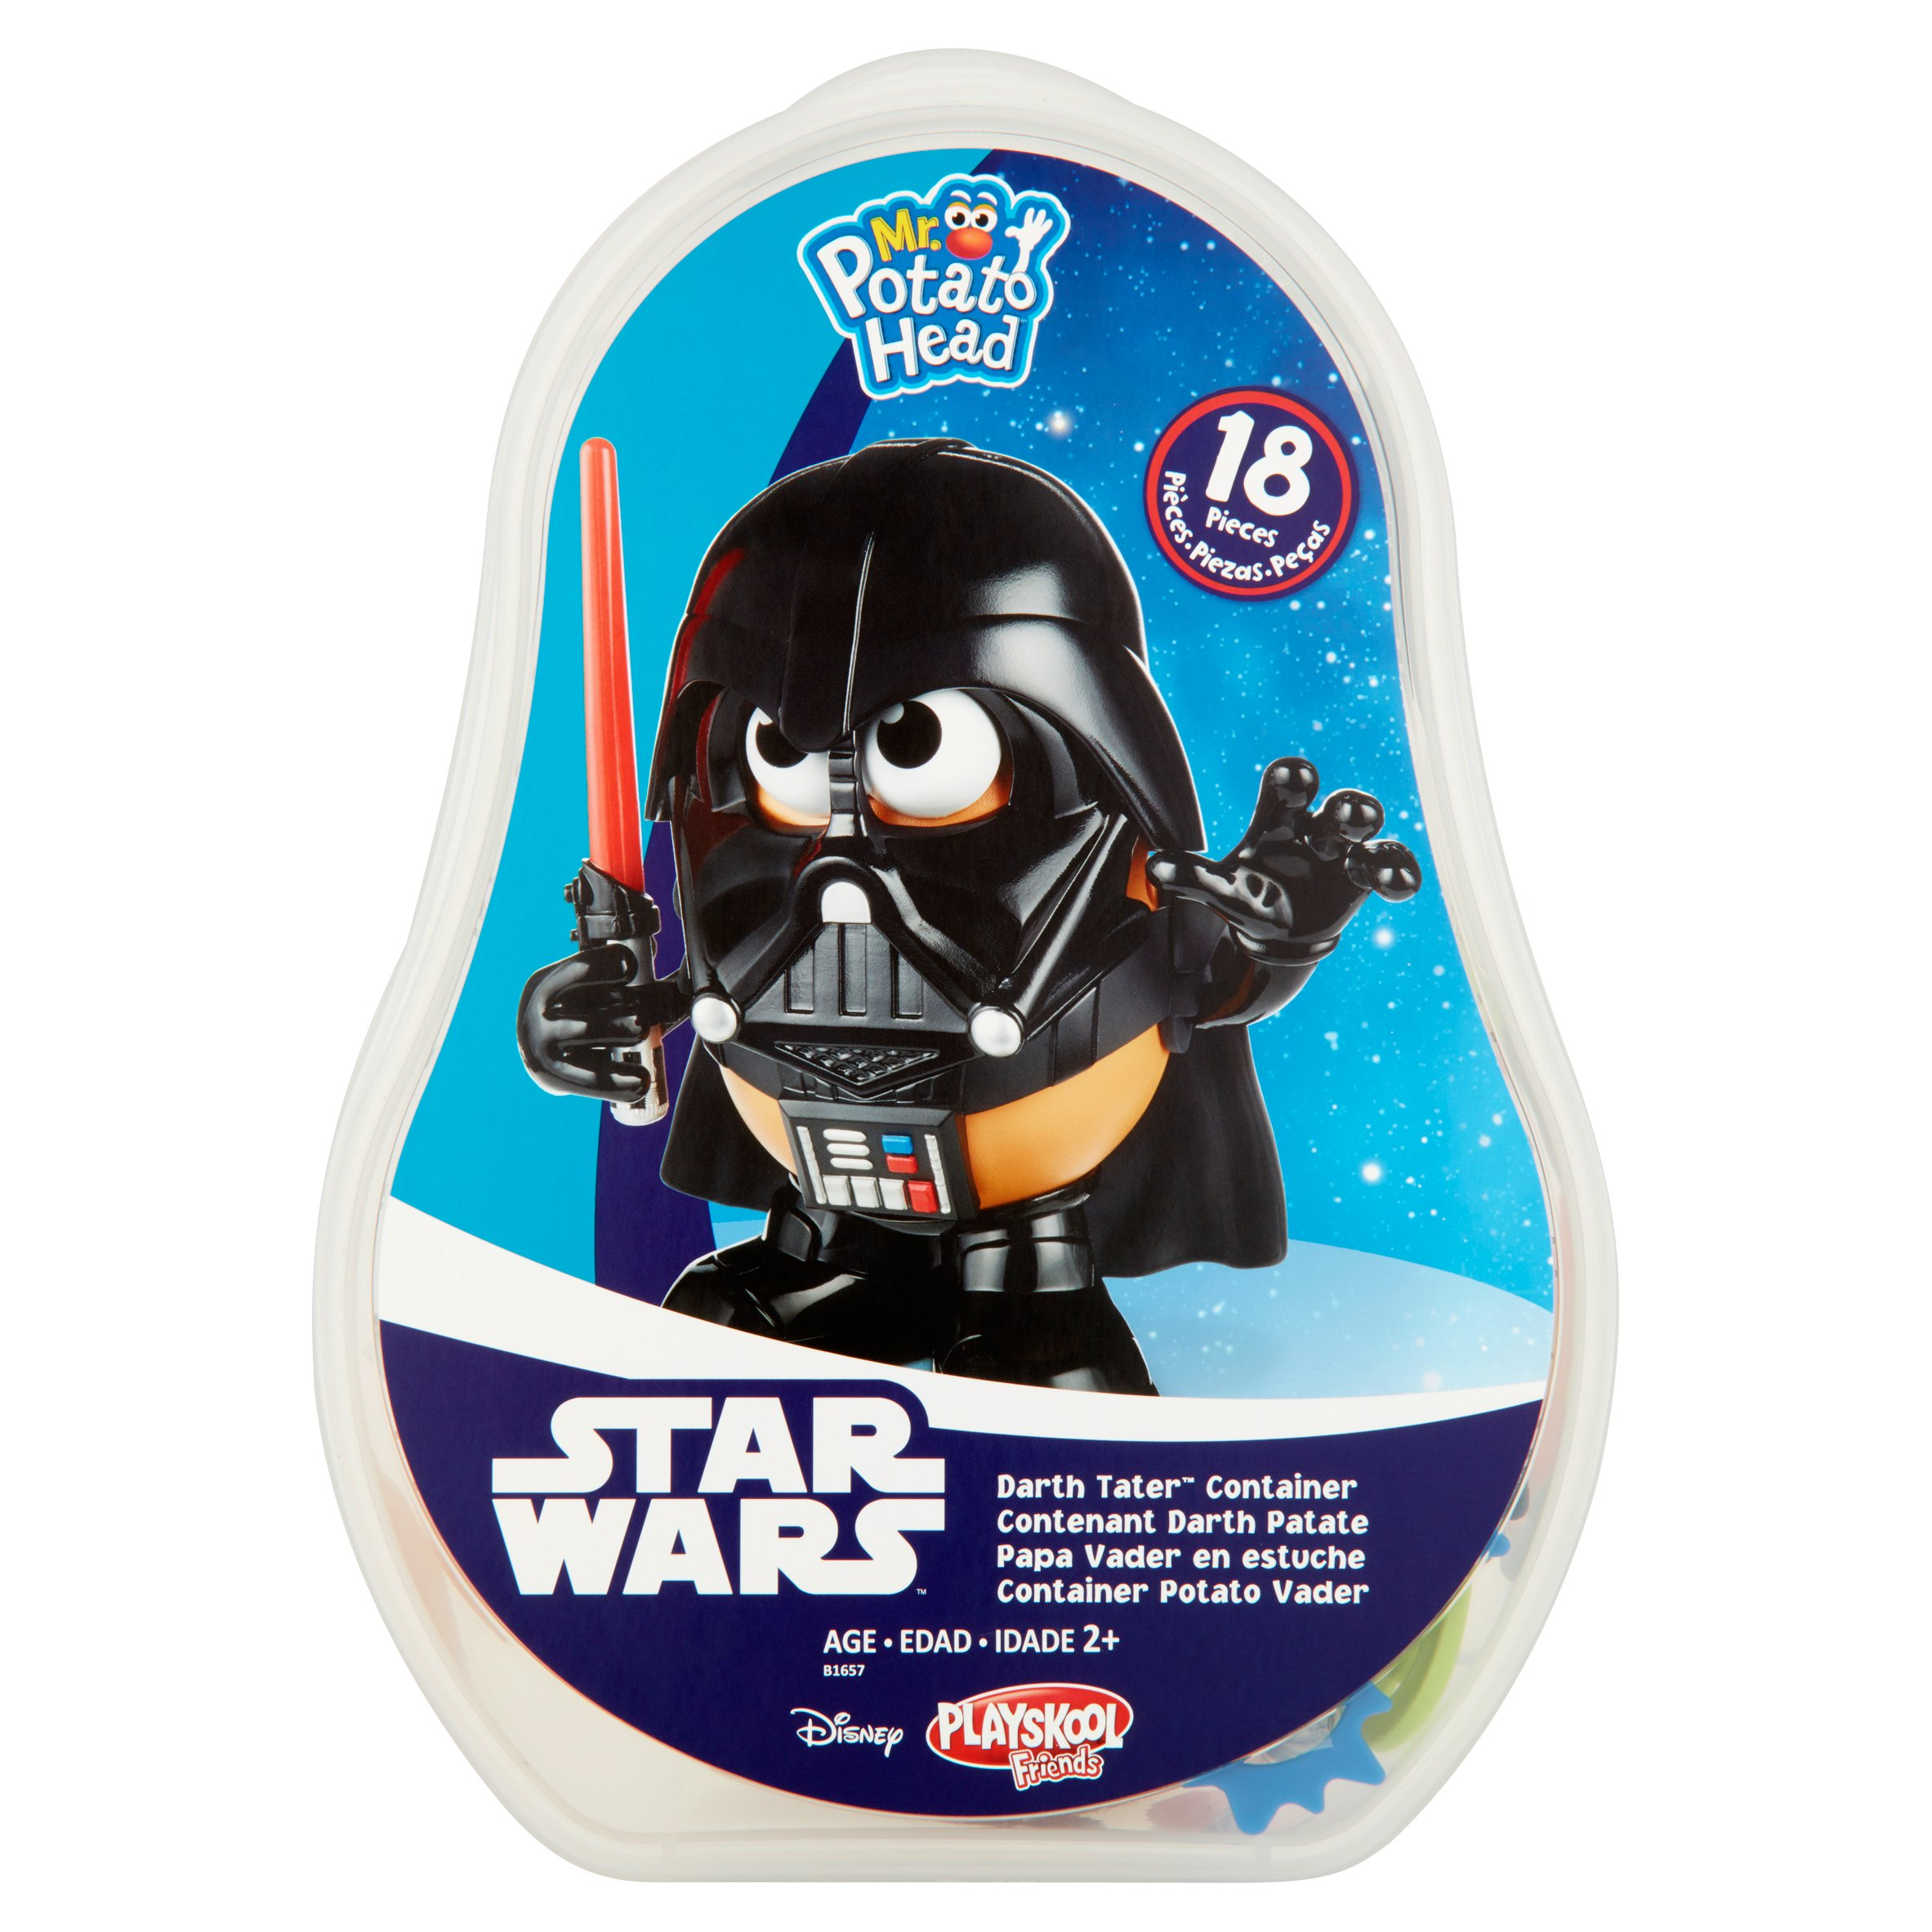 Disney Playskool Friends Star Wars Mr. Potato Head Darth Tater Container Age 2+, 18 count